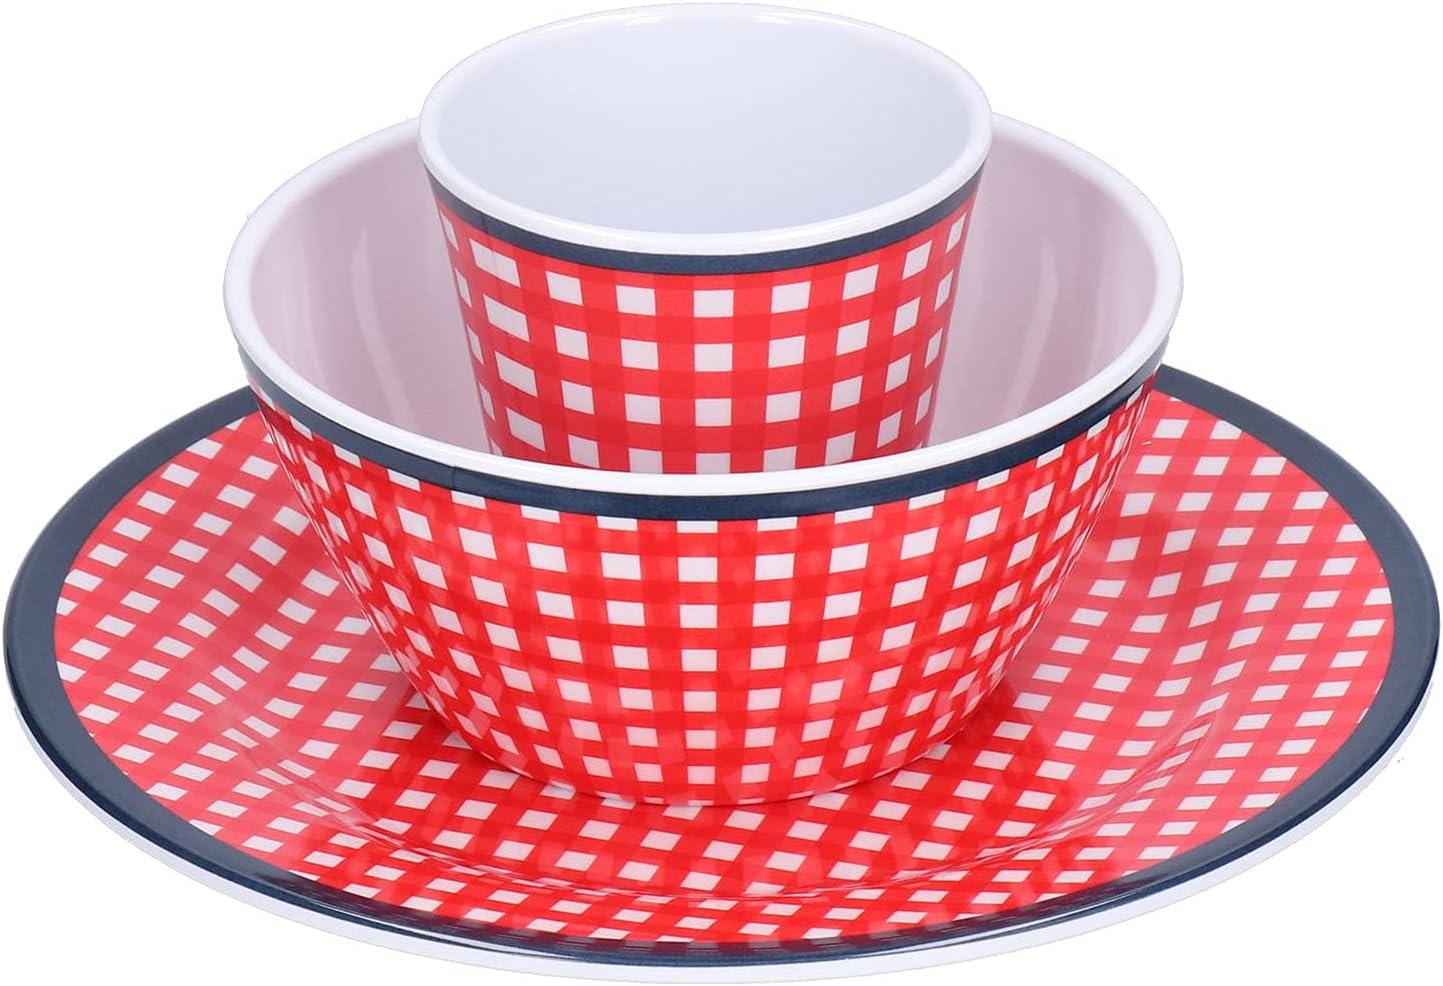 Plates And Genuine Bowls Sets Lightweight Dinnerware 3Pcs Sale item Set for H